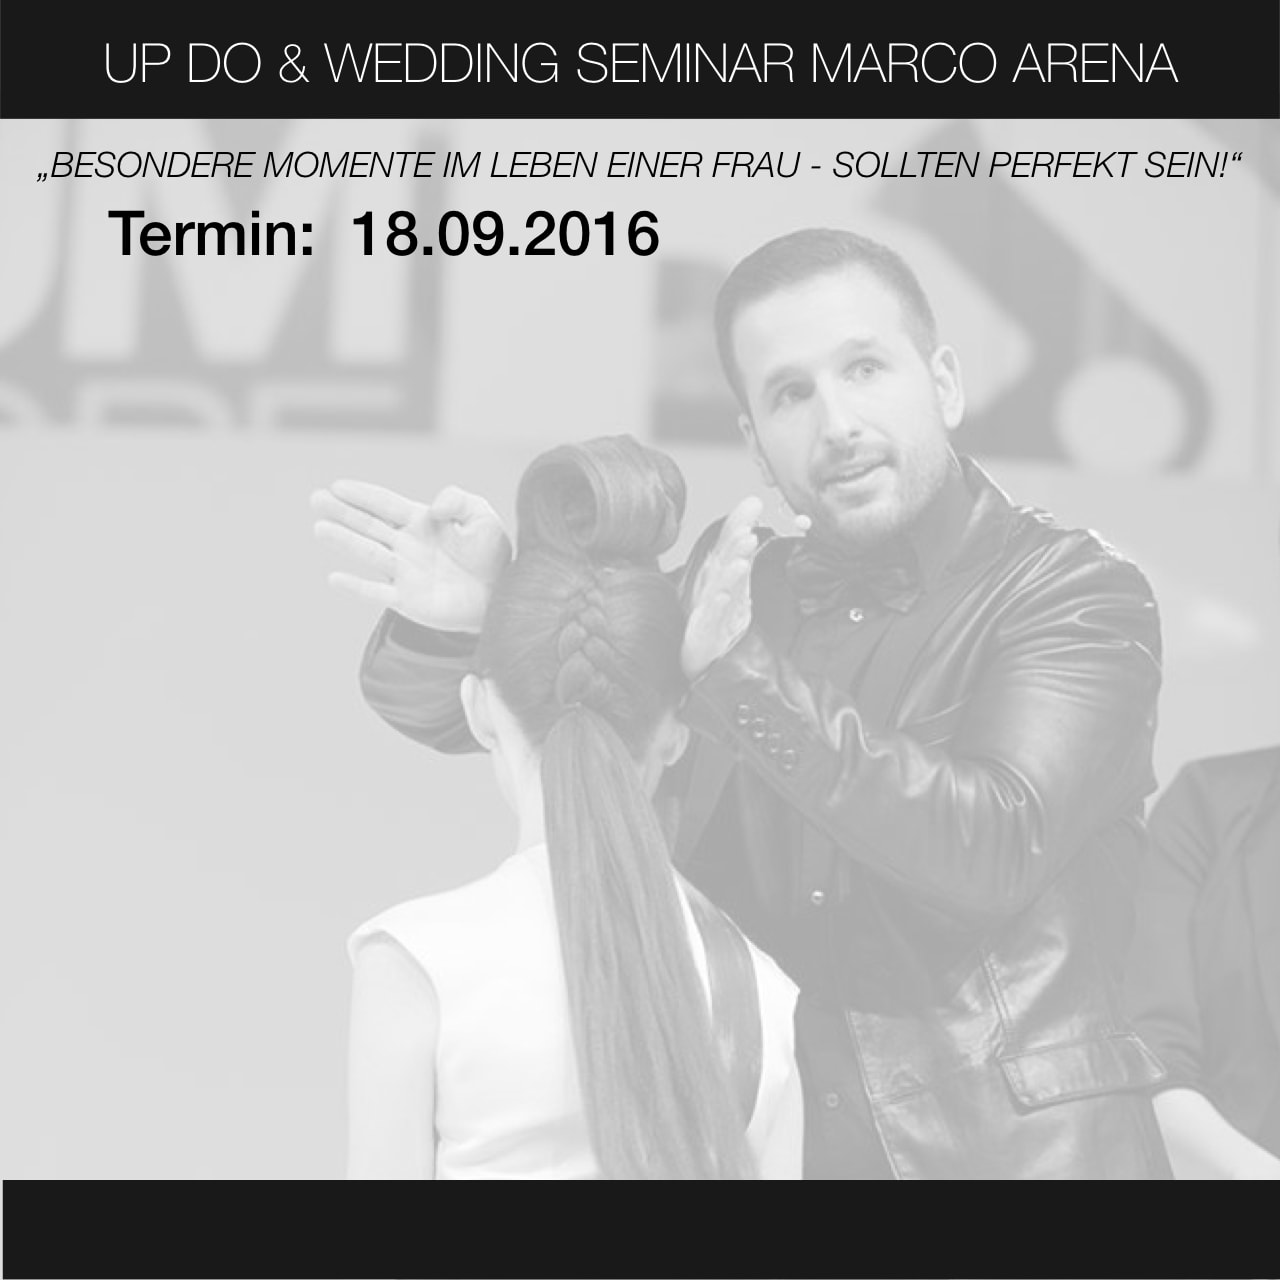 UPDO_WEDDING_SEMINAR